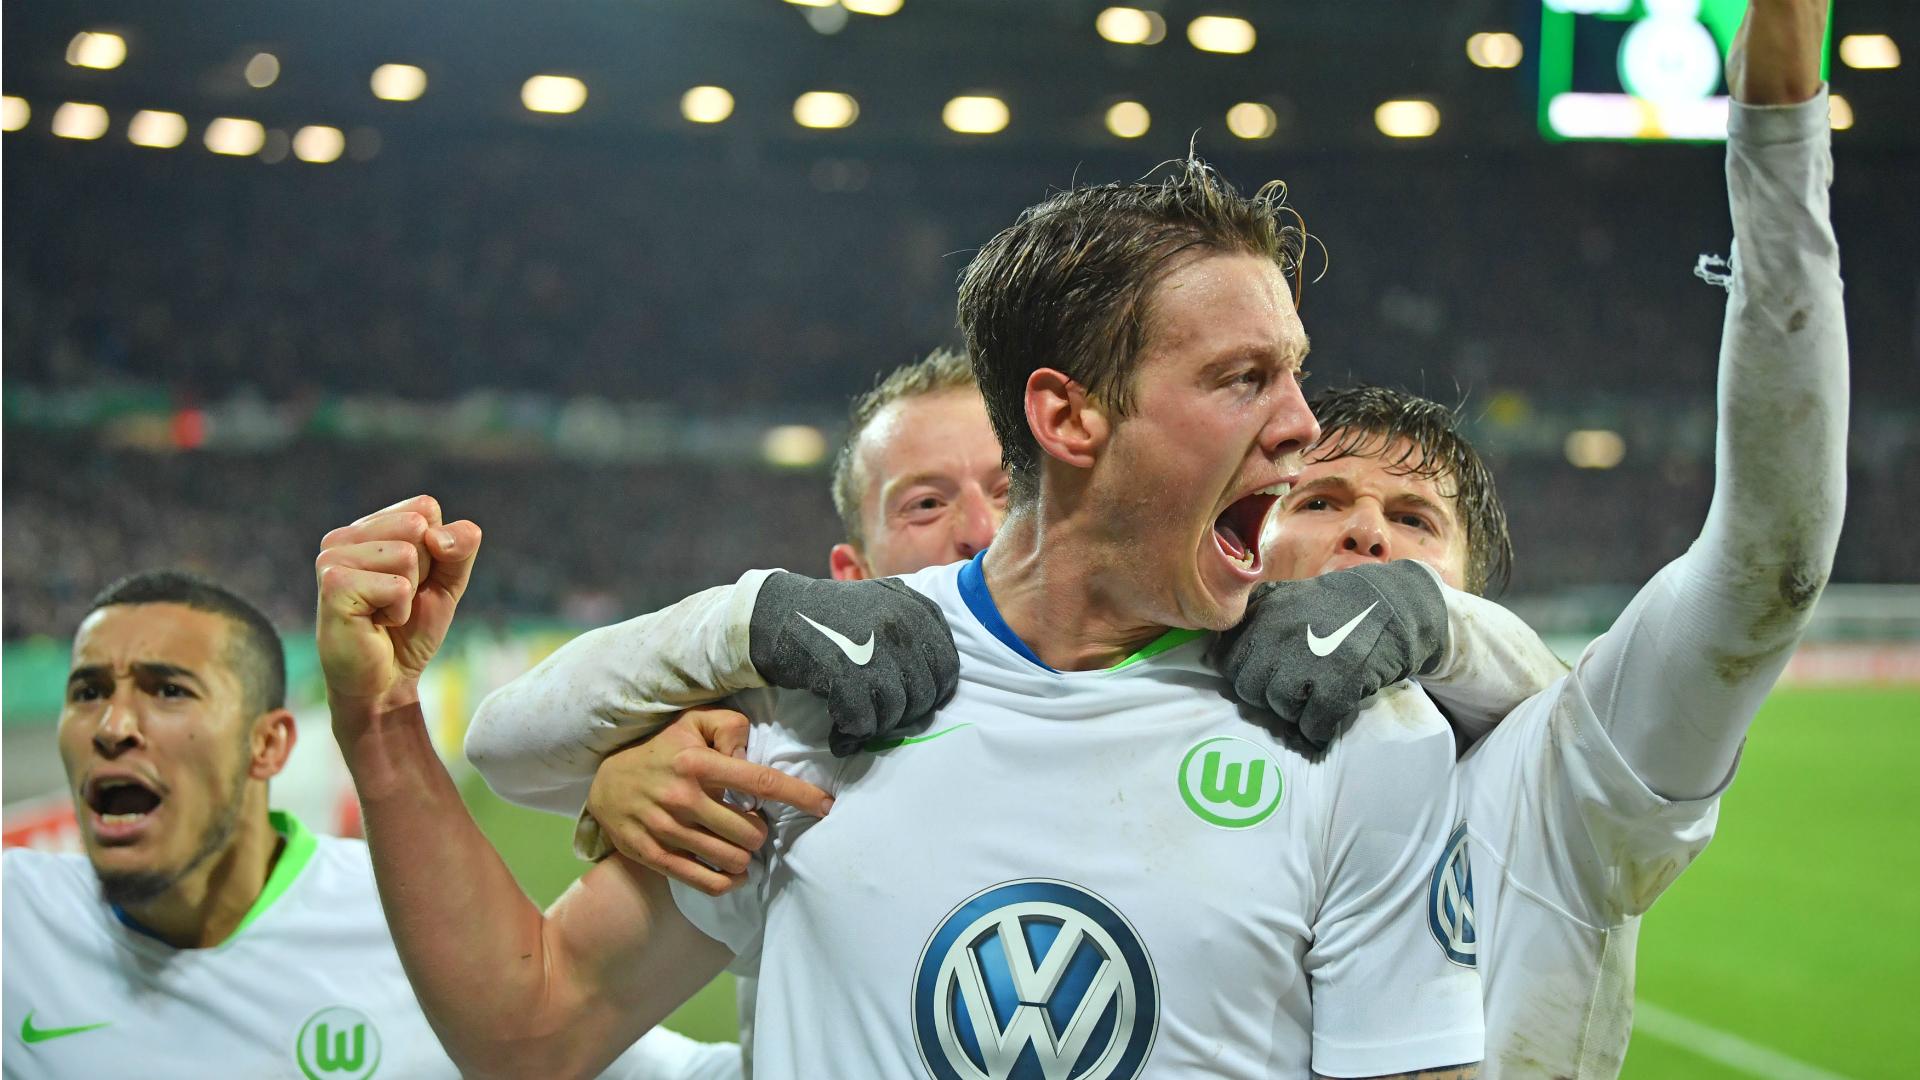 Wout Weghorst, Wolfsburg, DFB Pokal 10302018